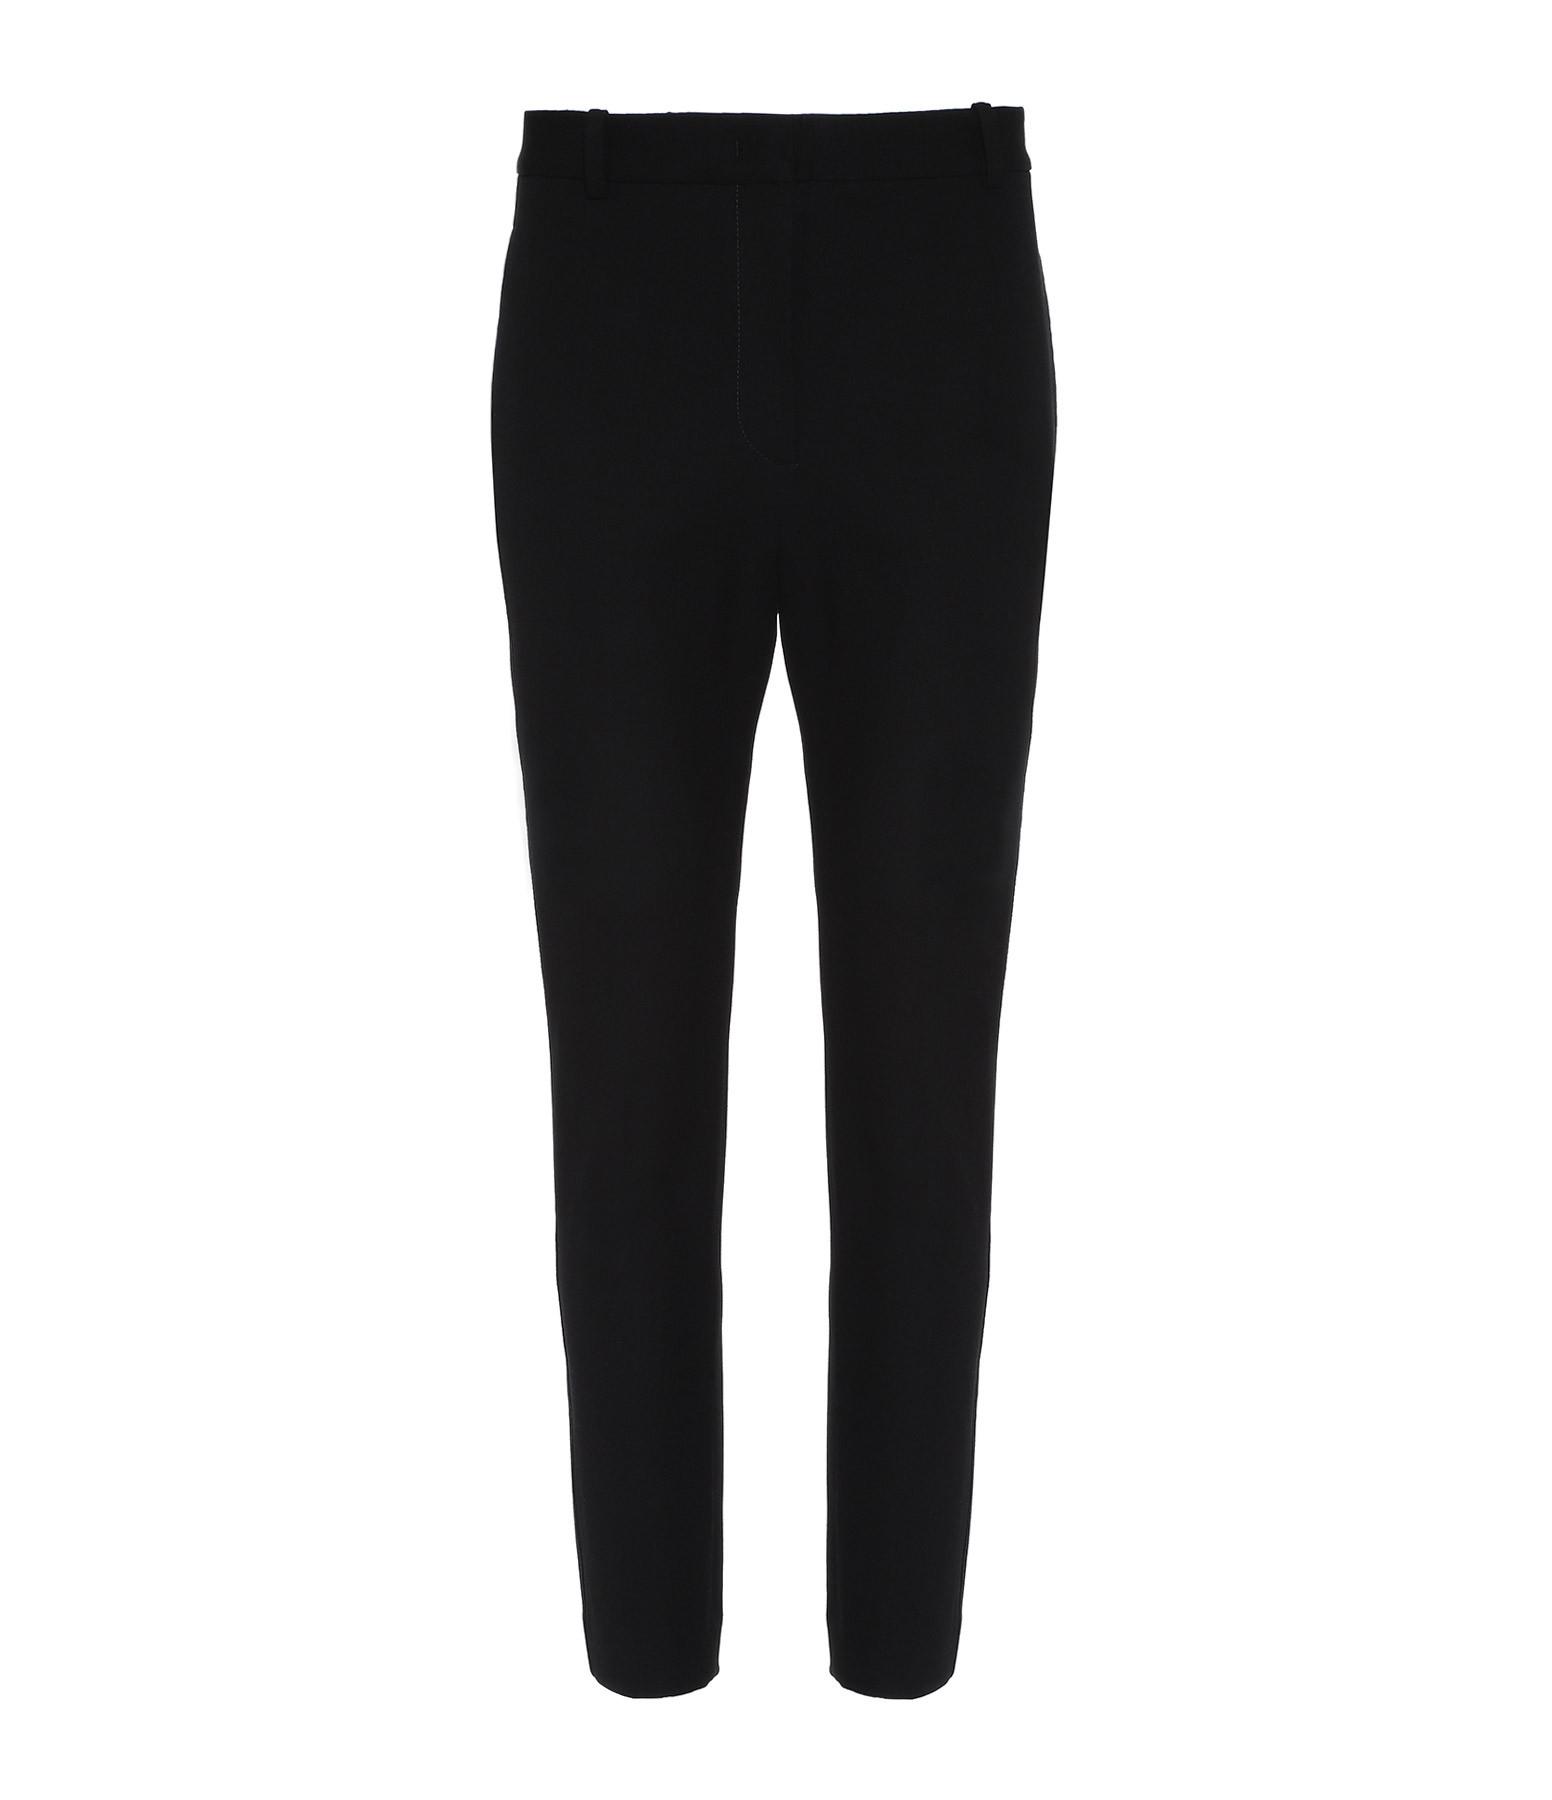 JOSEPH - Pantalon Zoom Gabardine Coton Noir